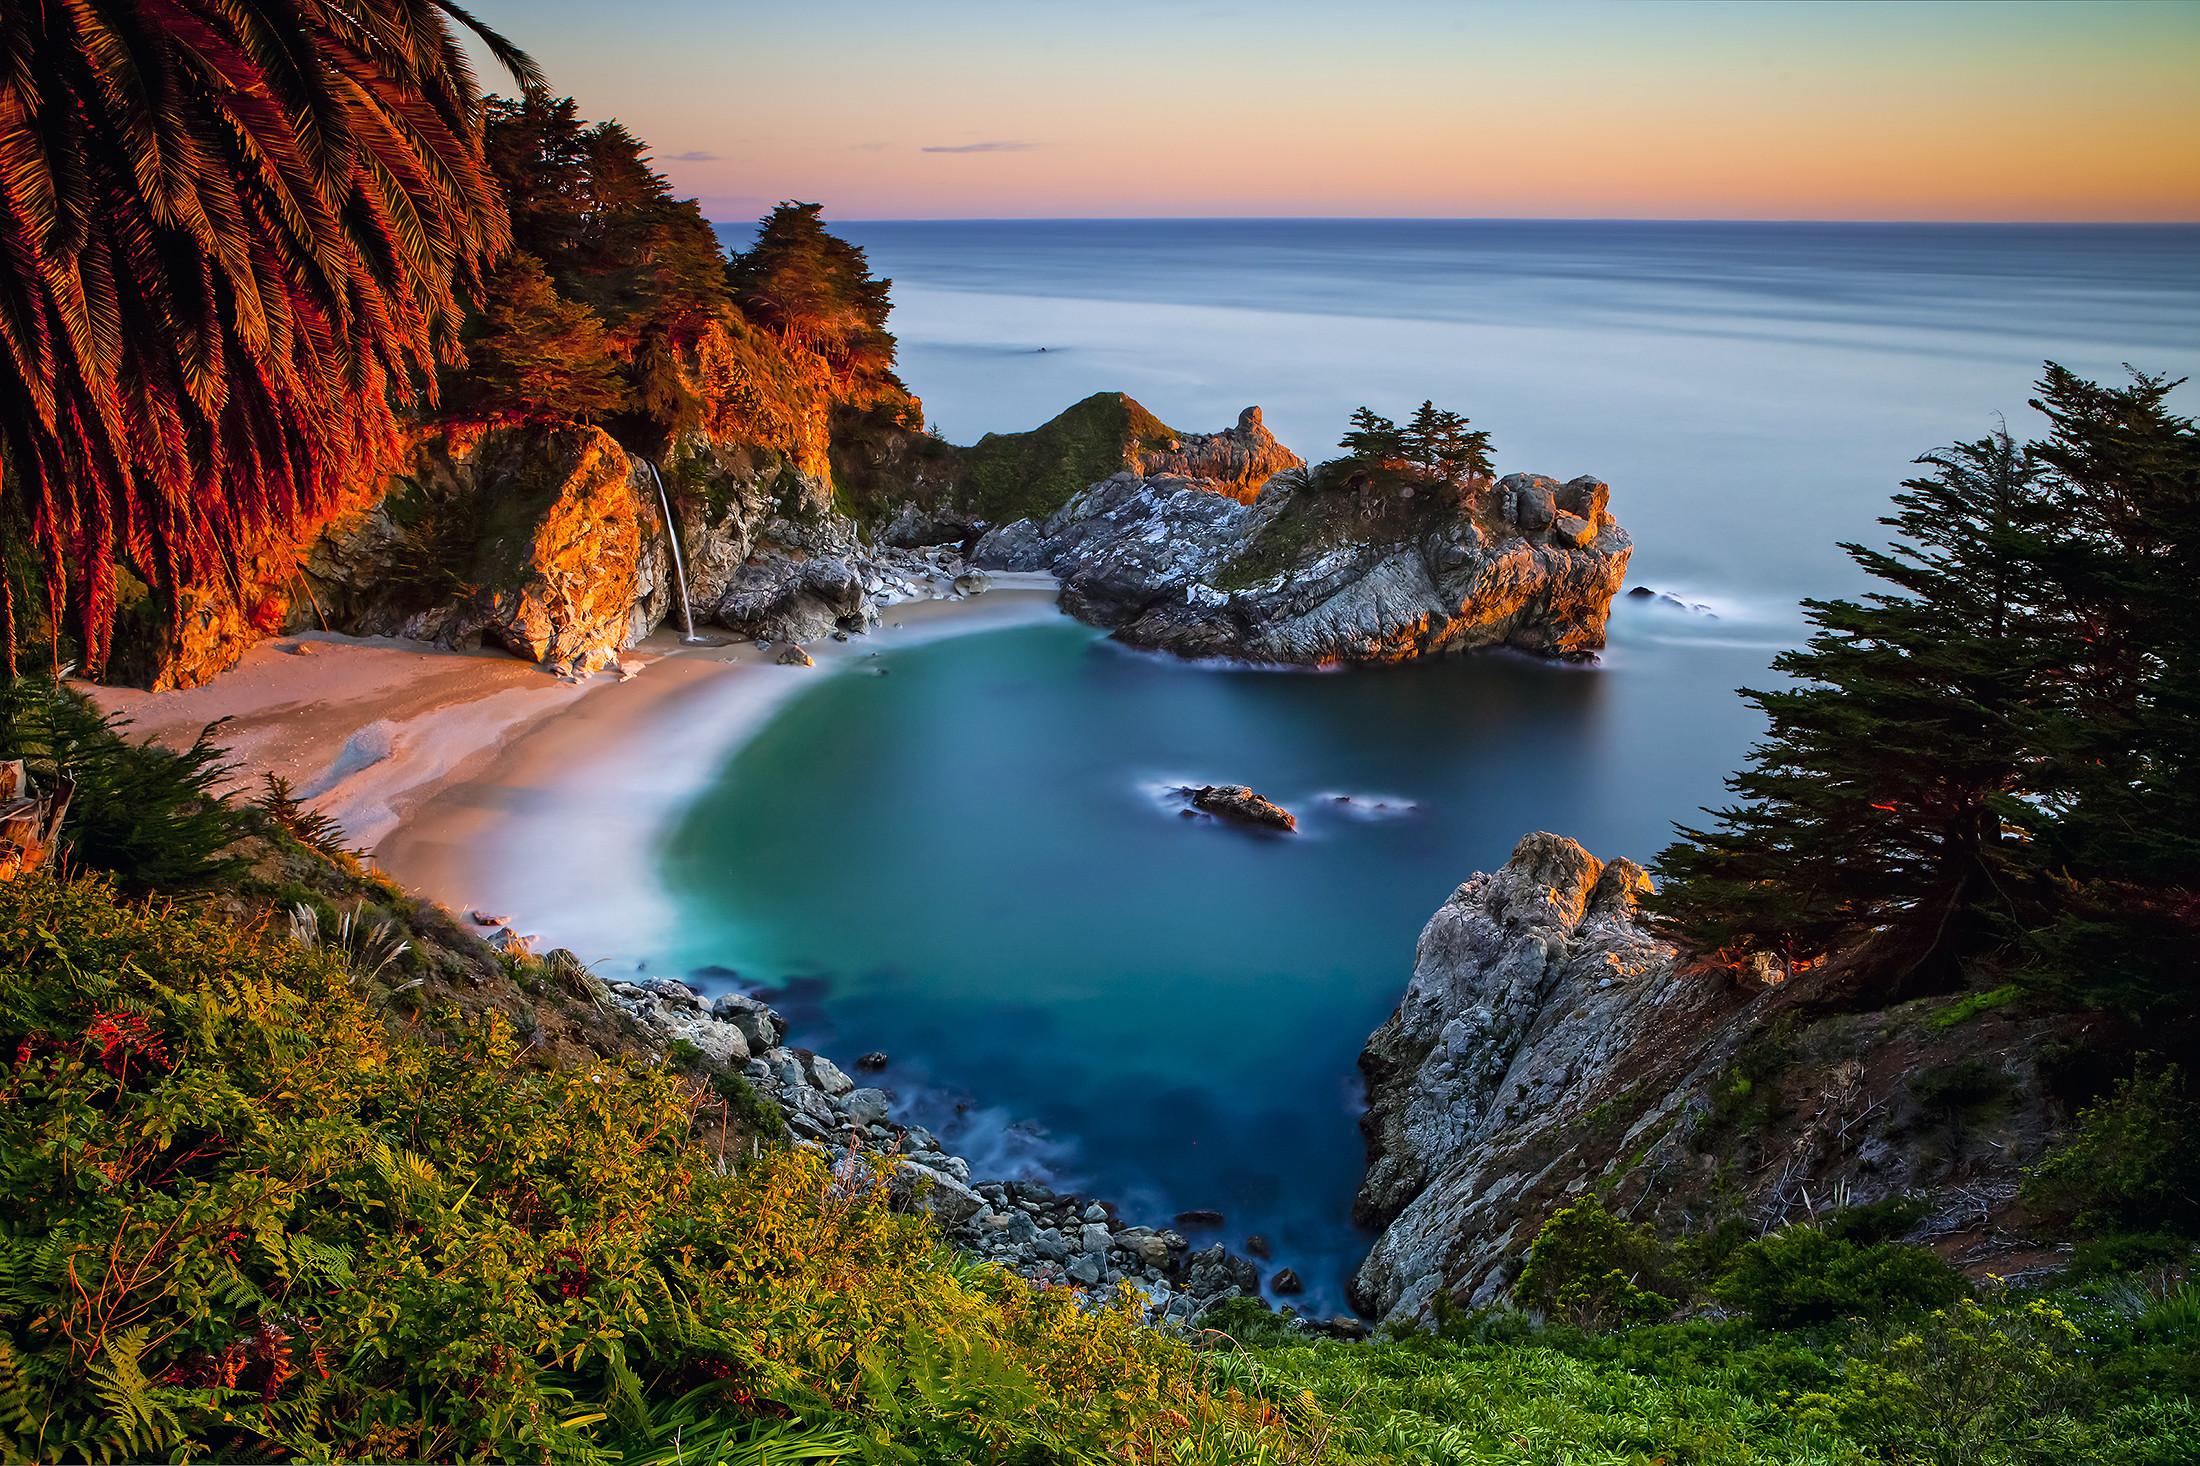 обои Julia Pfeiffer Burns State Park, Big Sur, Monterey County, California картинки фото